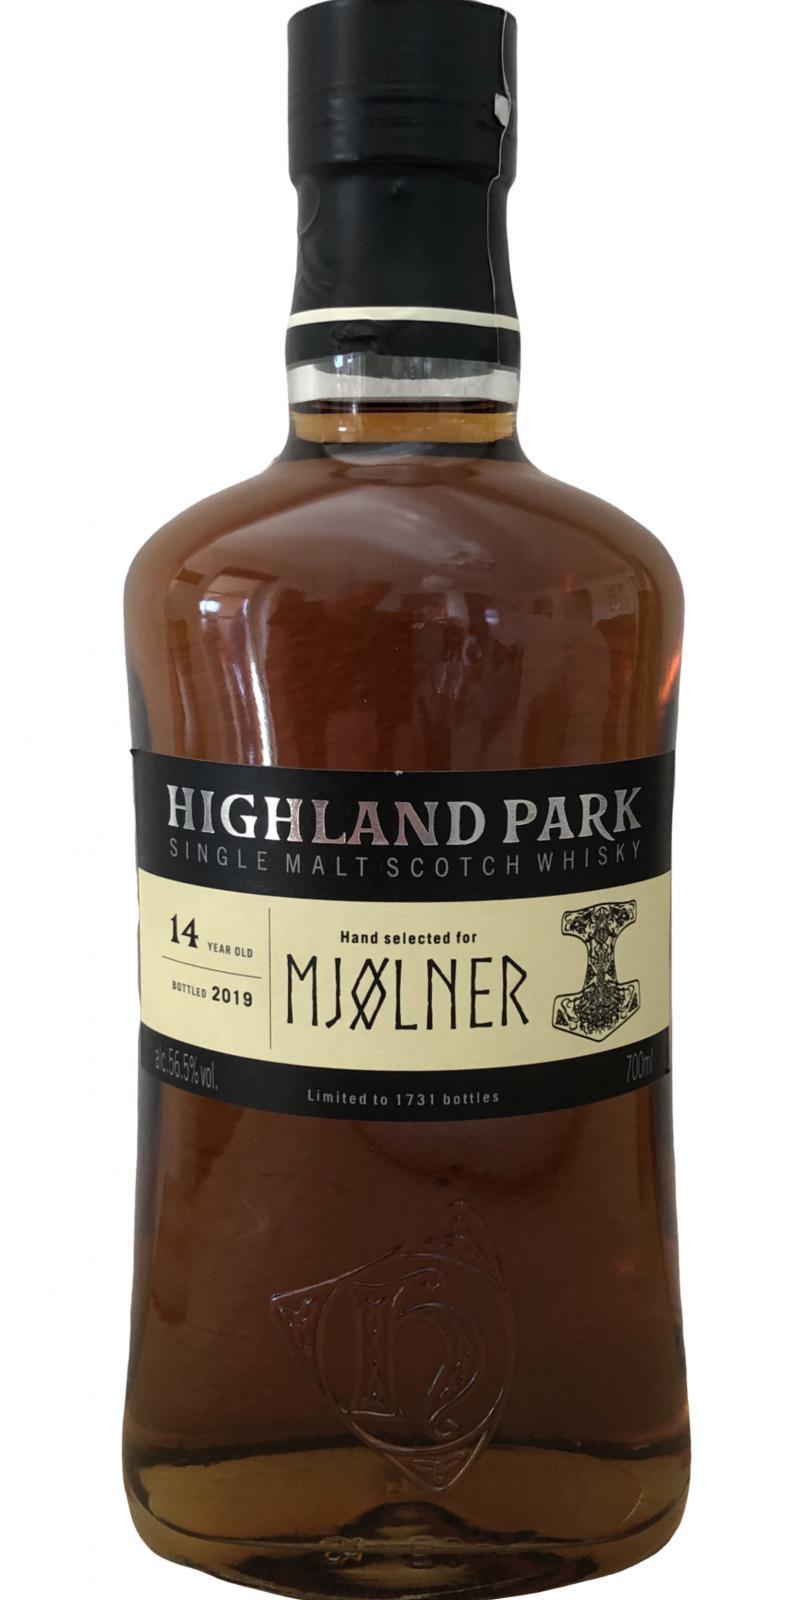 Highland Park 14-year-old - Mjølner